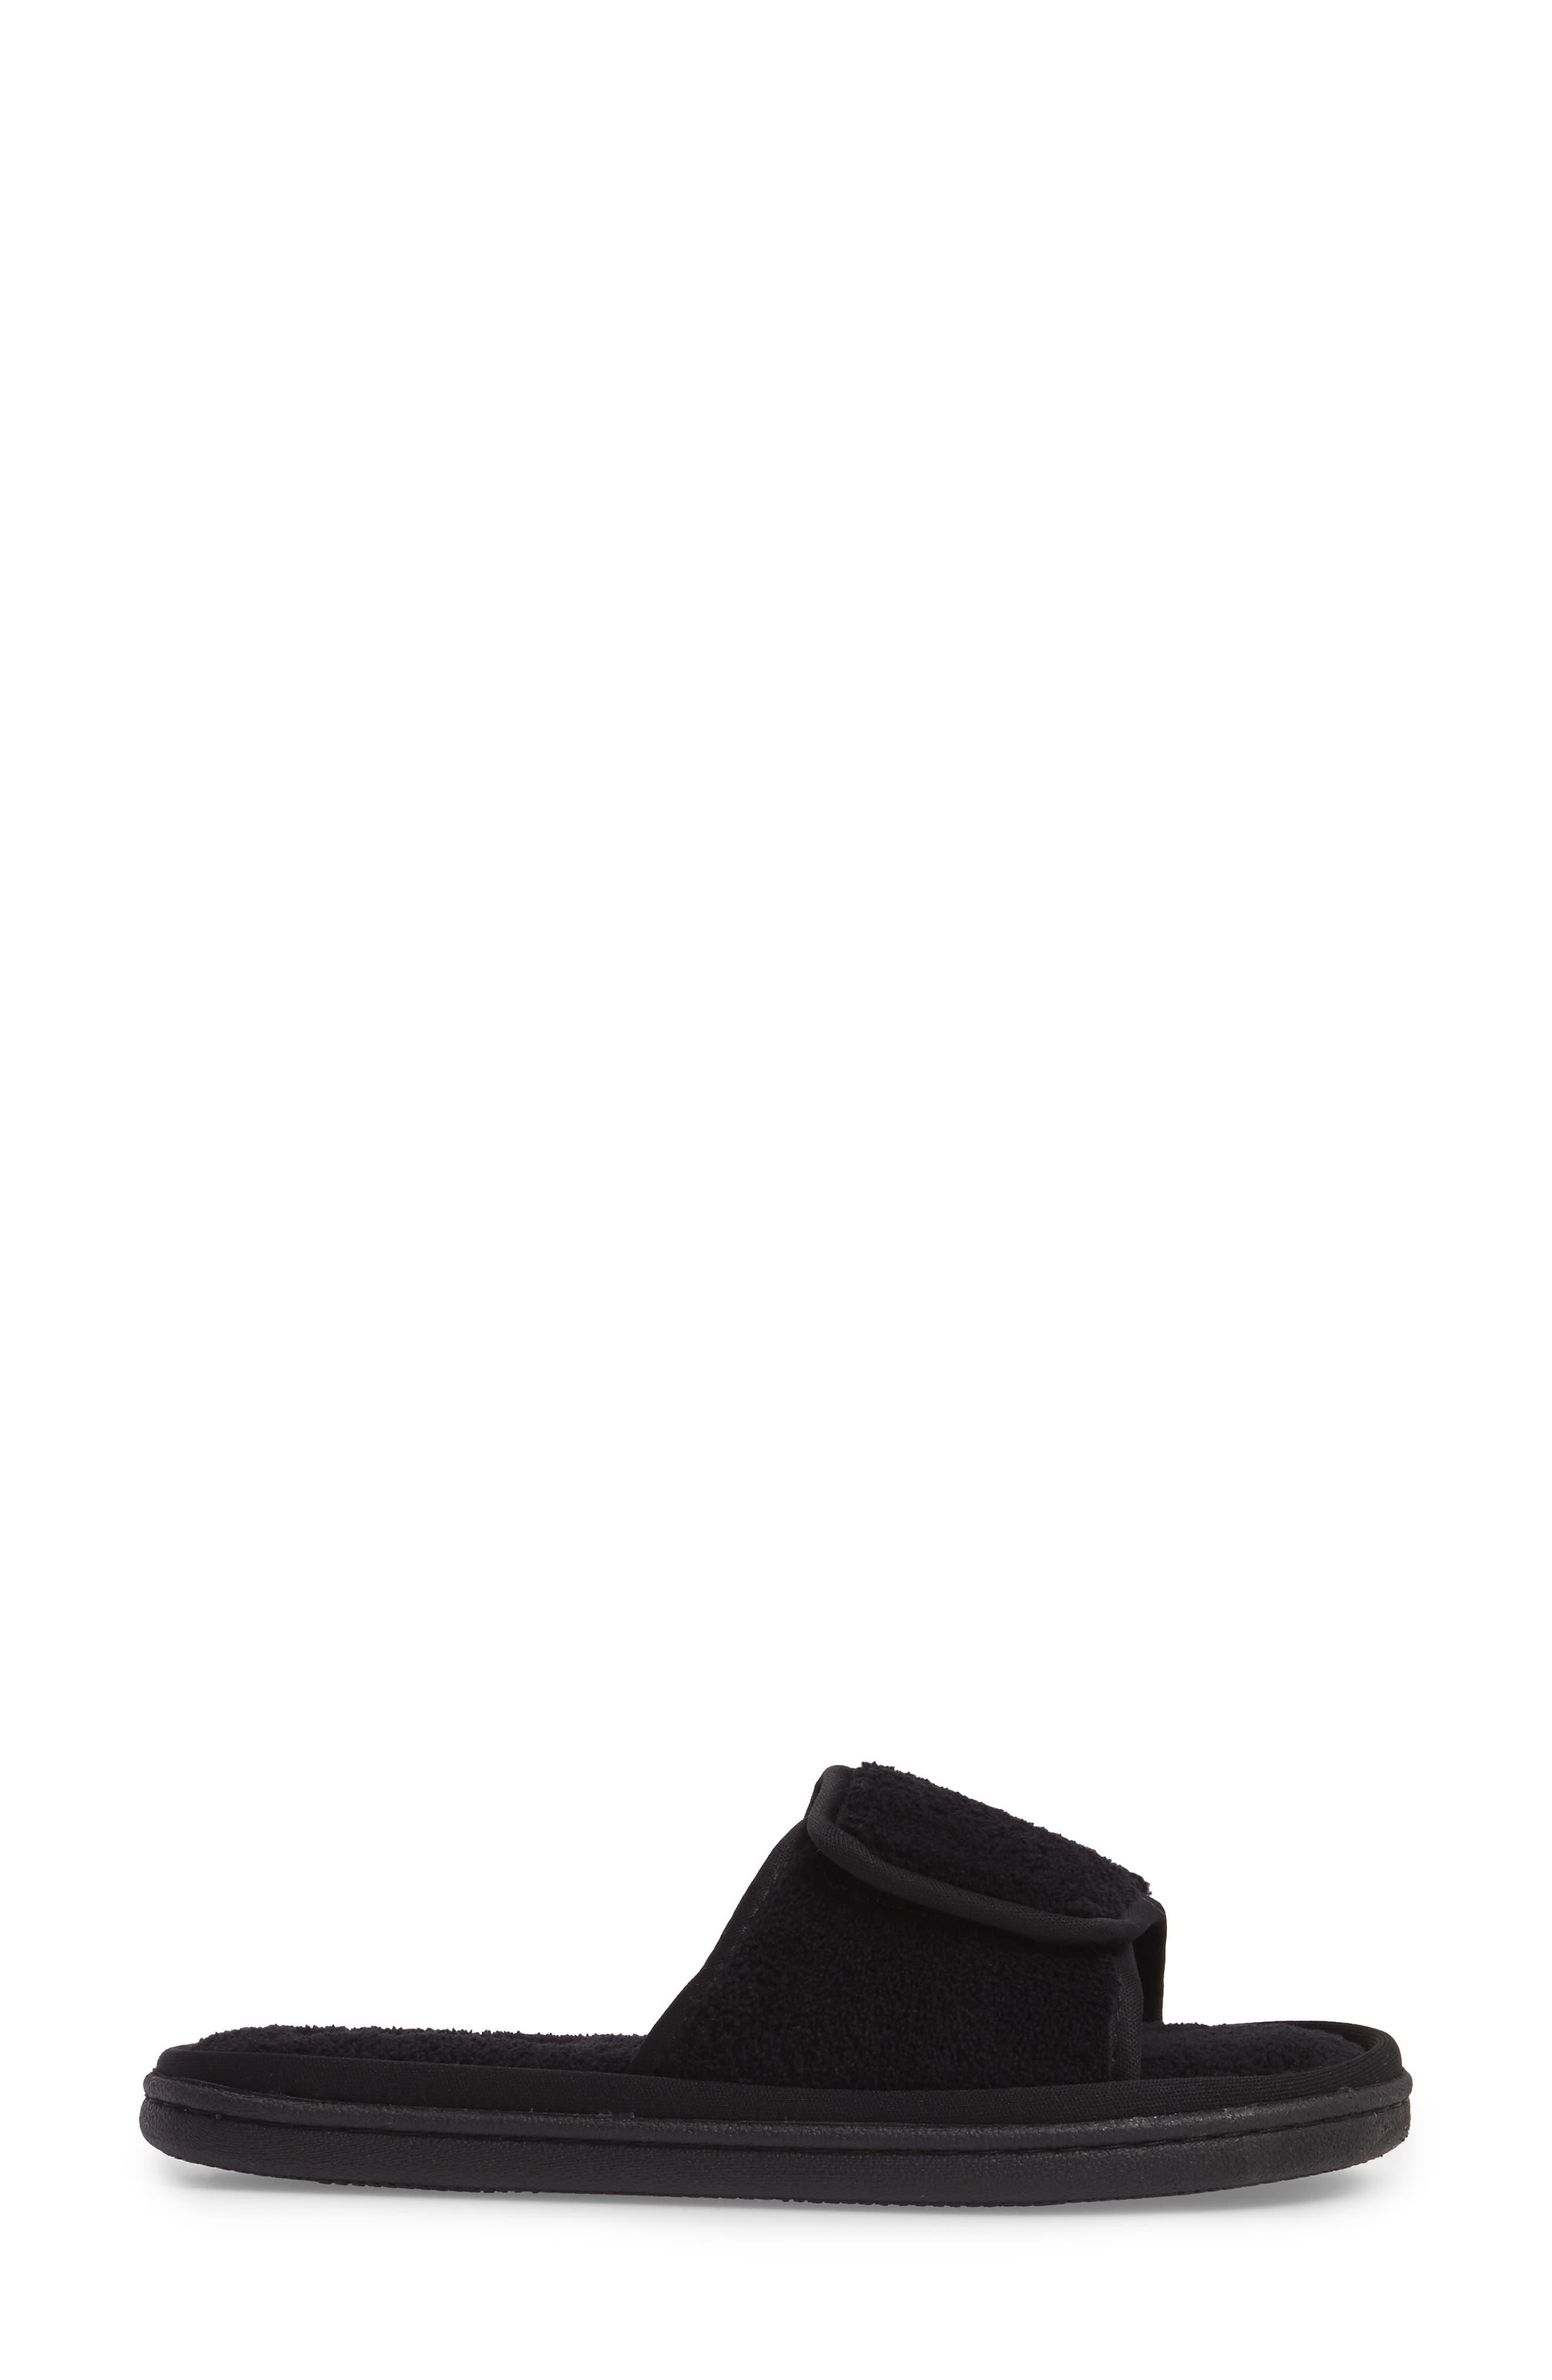 Geana Slipper,                             Alternate thumbnail 3, color,                             Black Fabric